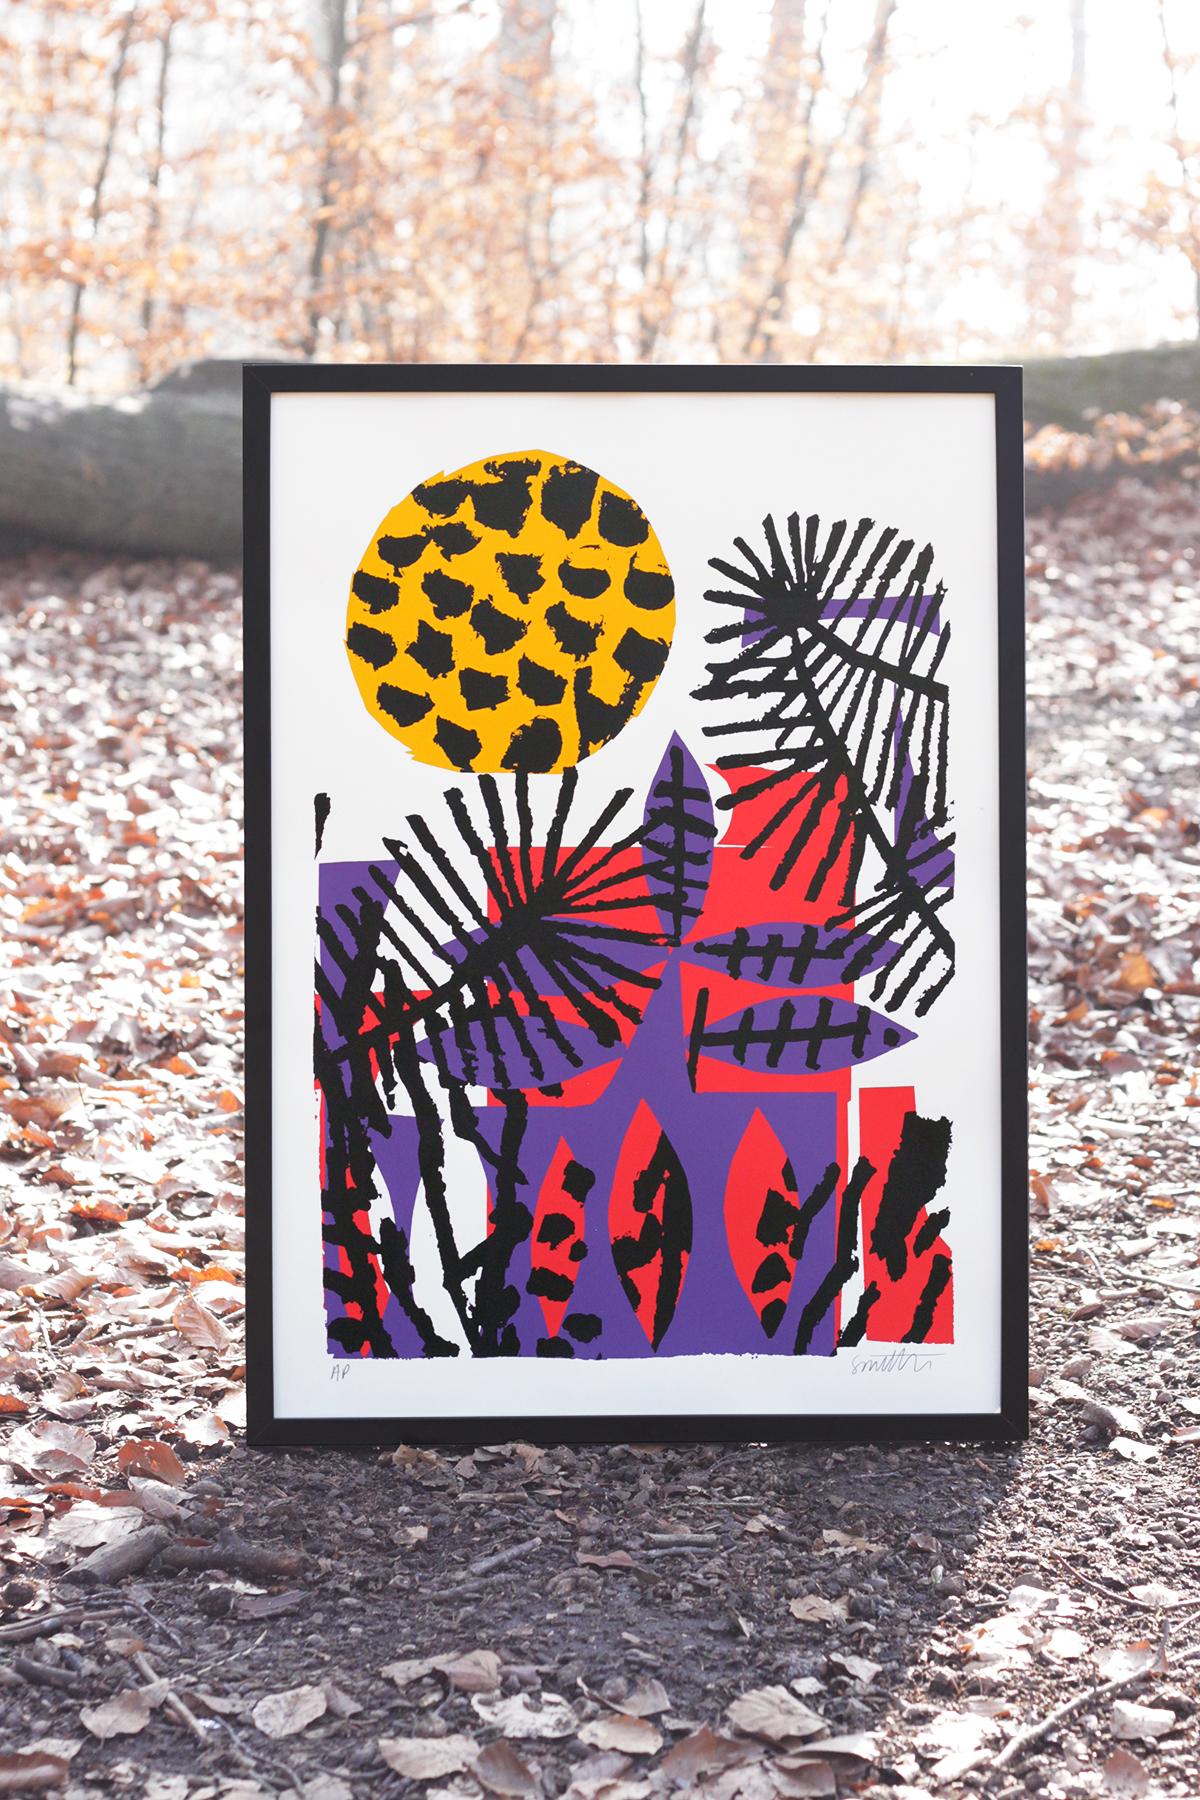 The Jaunt #49 - Stephen Smith 50cm x 70cm, 4 colour silkscreen print, 2018 http://www.thejaunt.net/printarchive/049-stephensmith